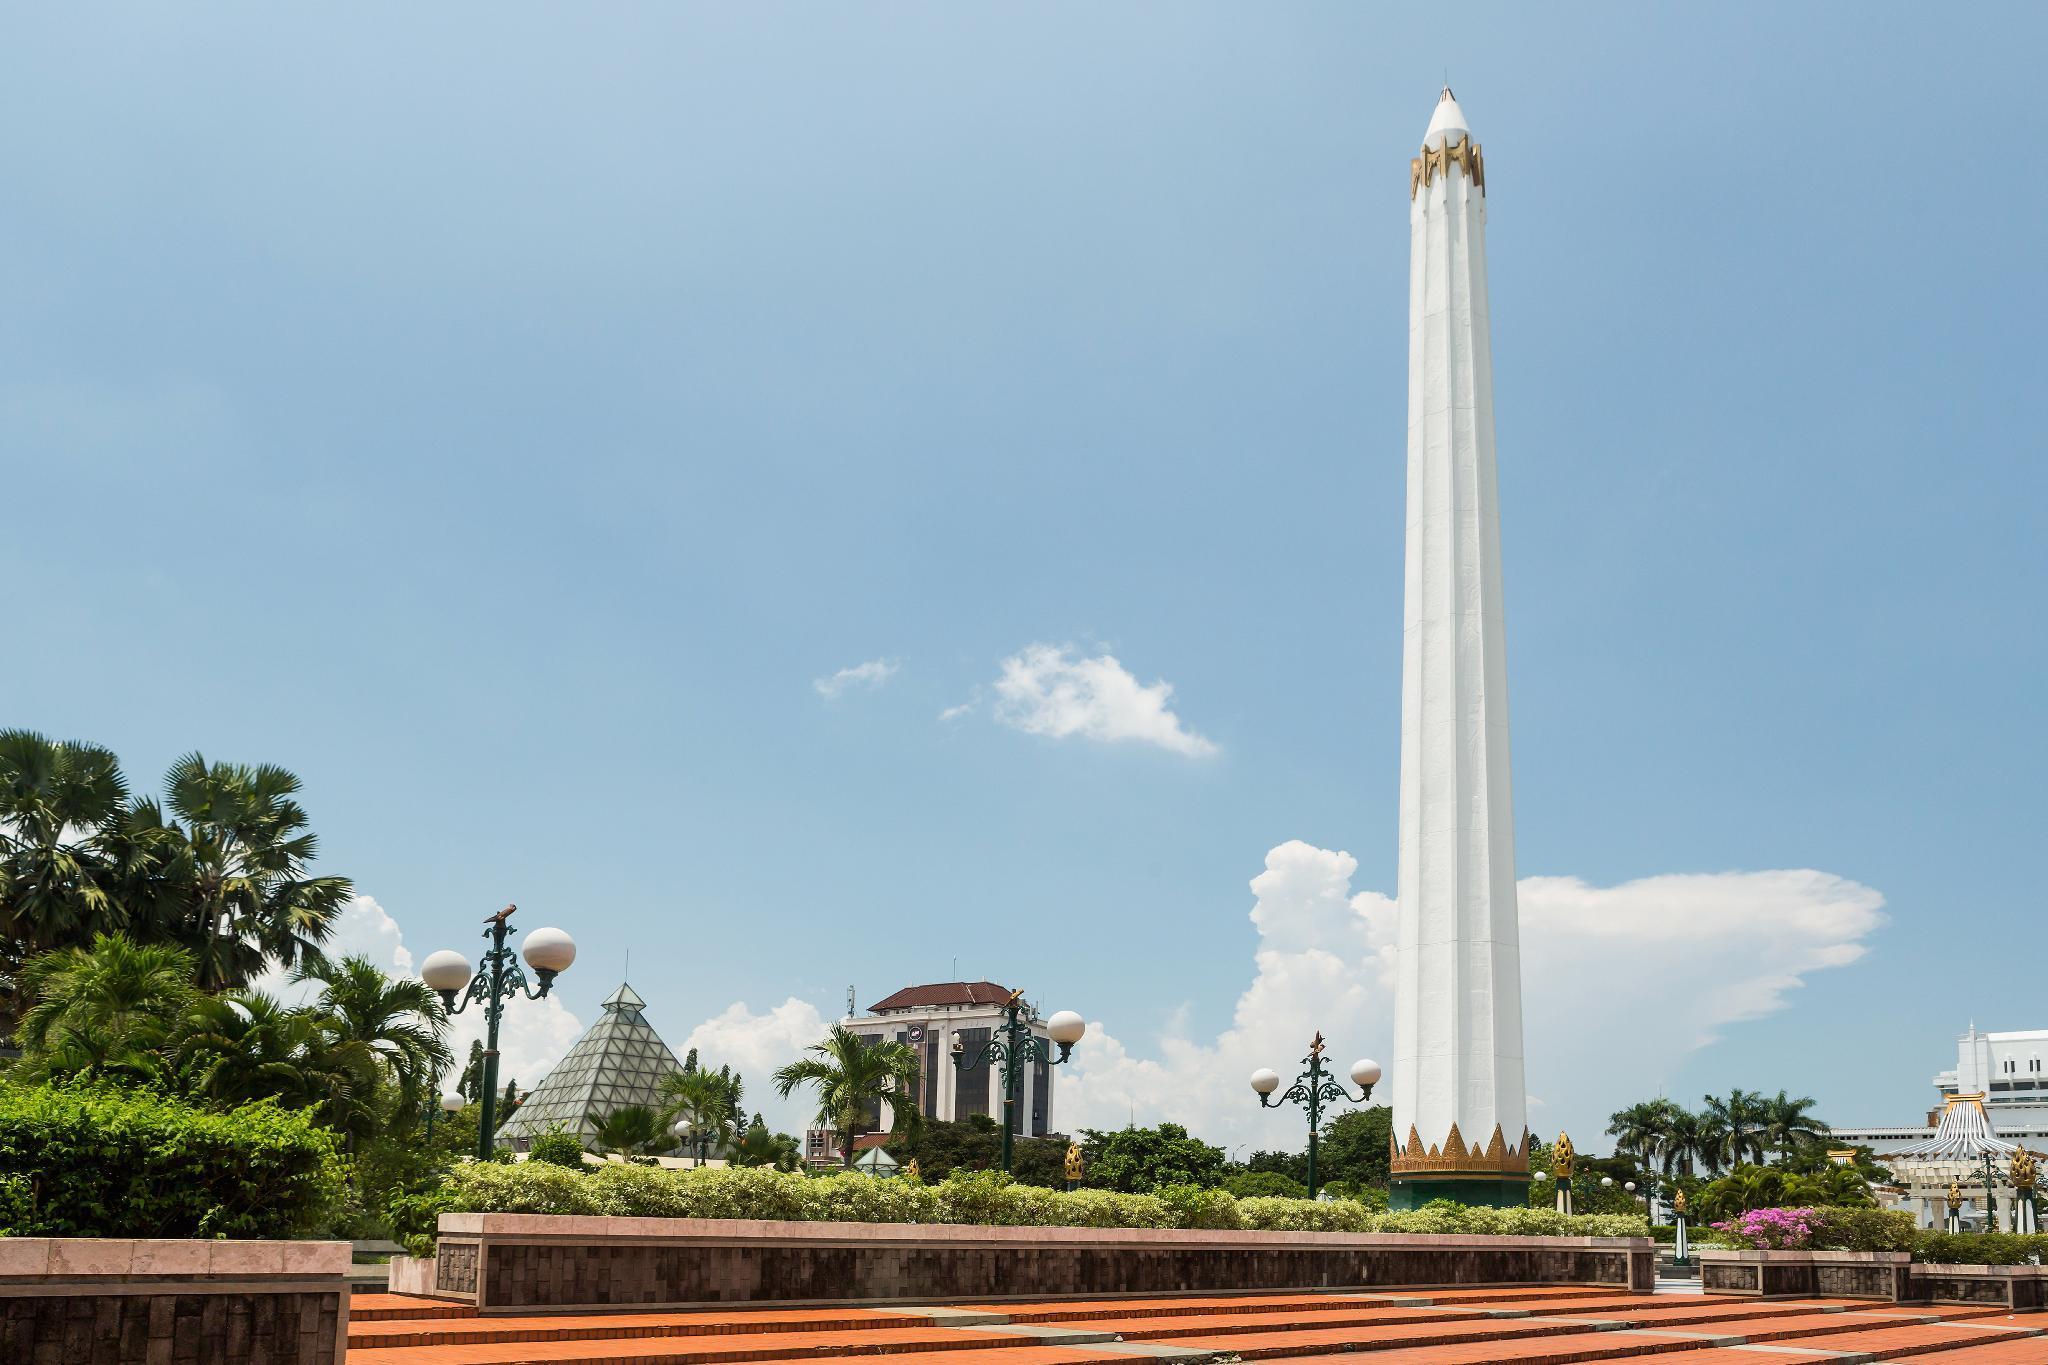 RedDoorz Apartment near Exit Toll Kota Satelit, Surabaya